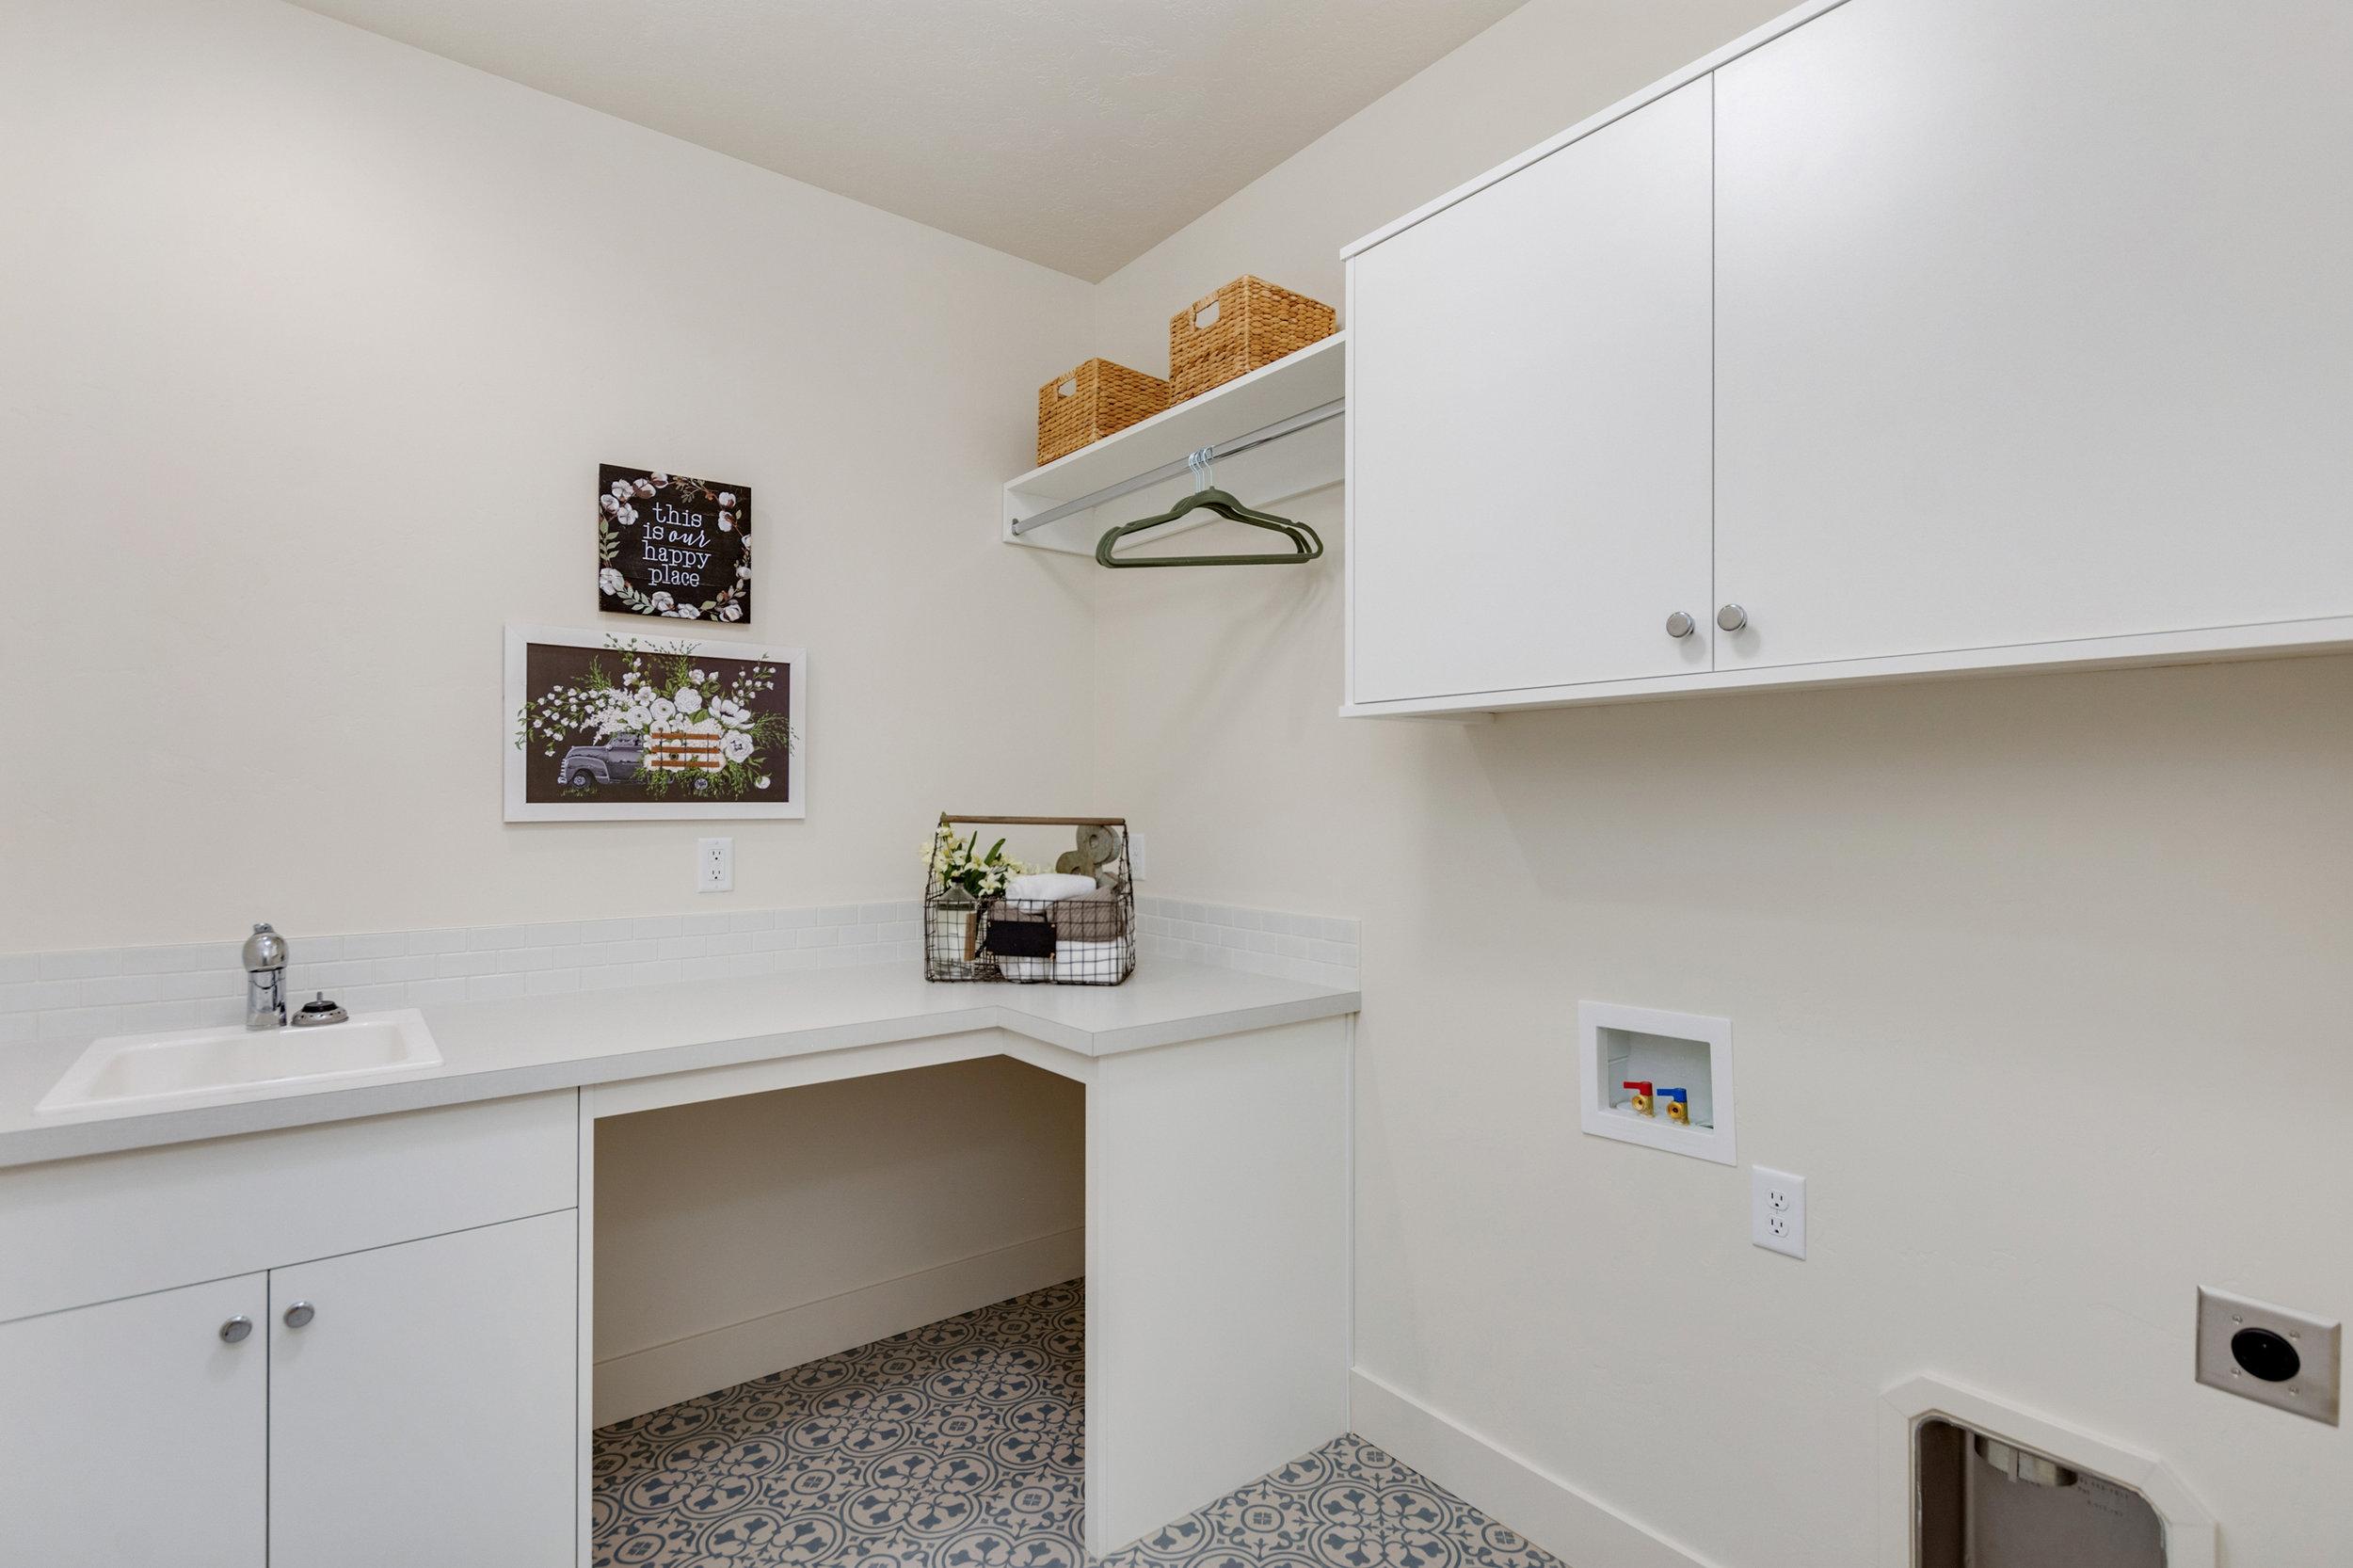 34-Laundry Room.jpg